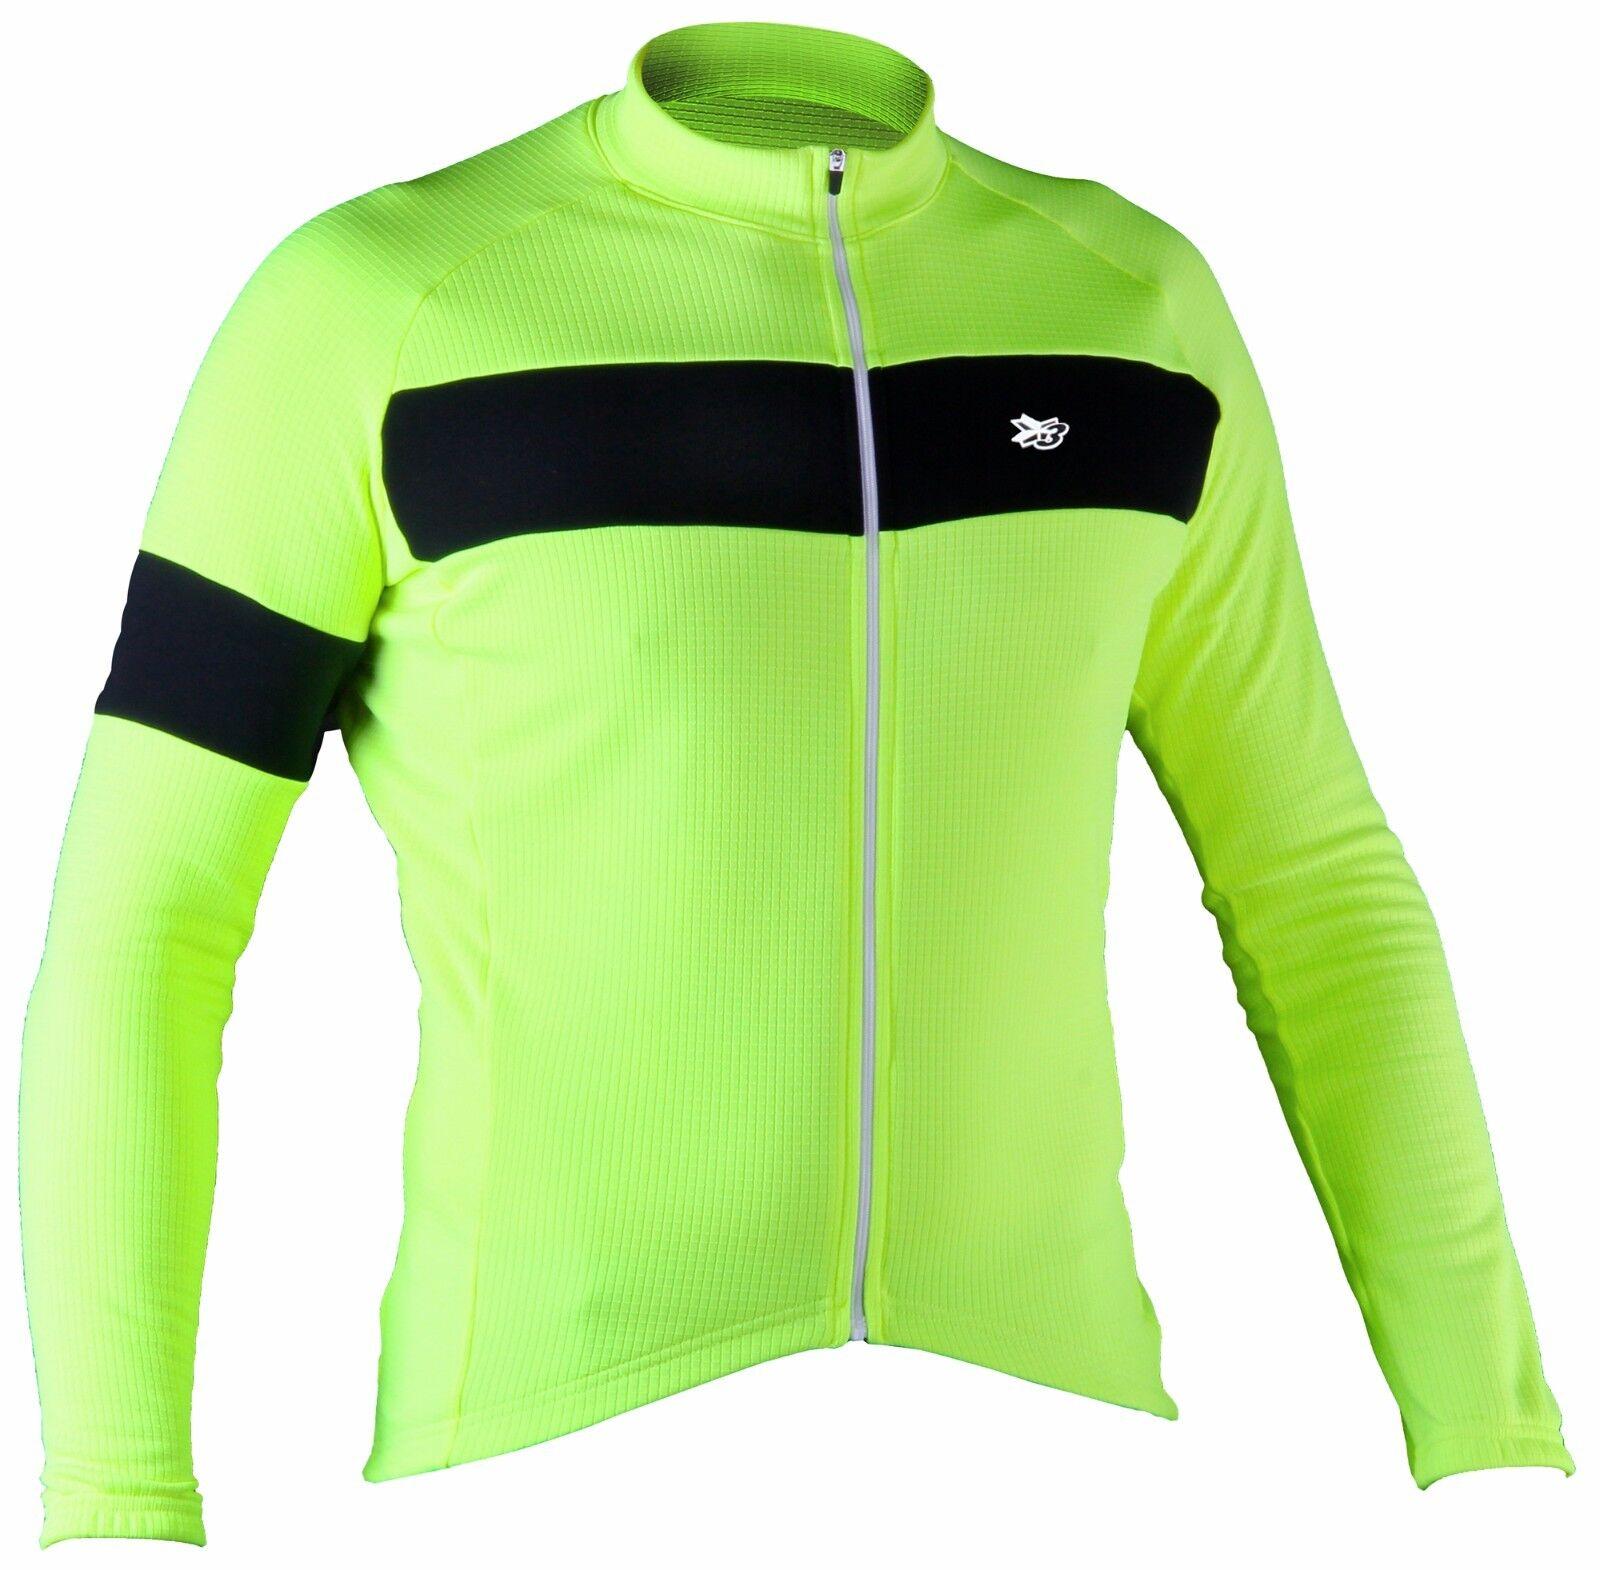 Maglia uomoica lunga ciclismo giacca leggera gituttio fluo abgreeliamento bici mtb